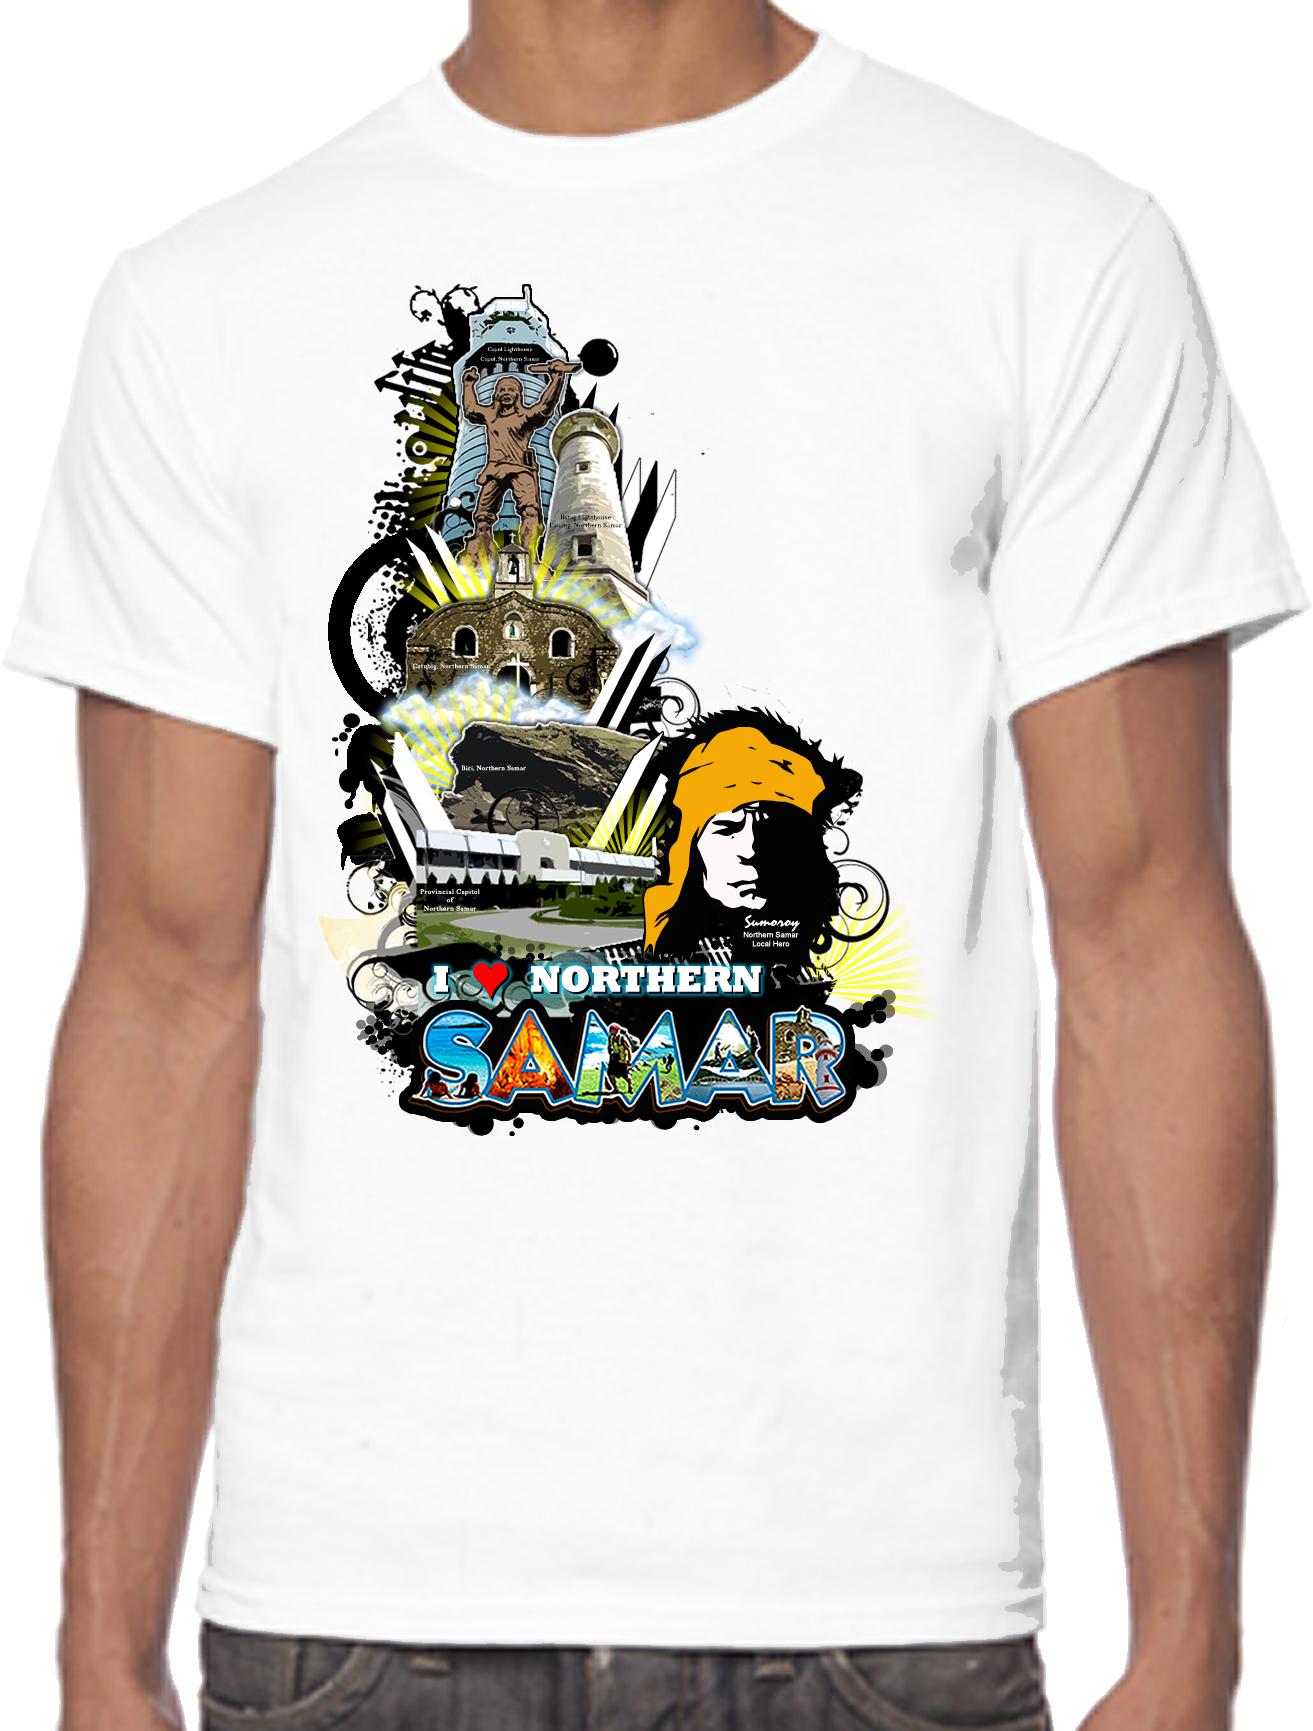 https://kustomays.com/wp-content/uploads/2013/05/Northern-Samar-Shirt.png